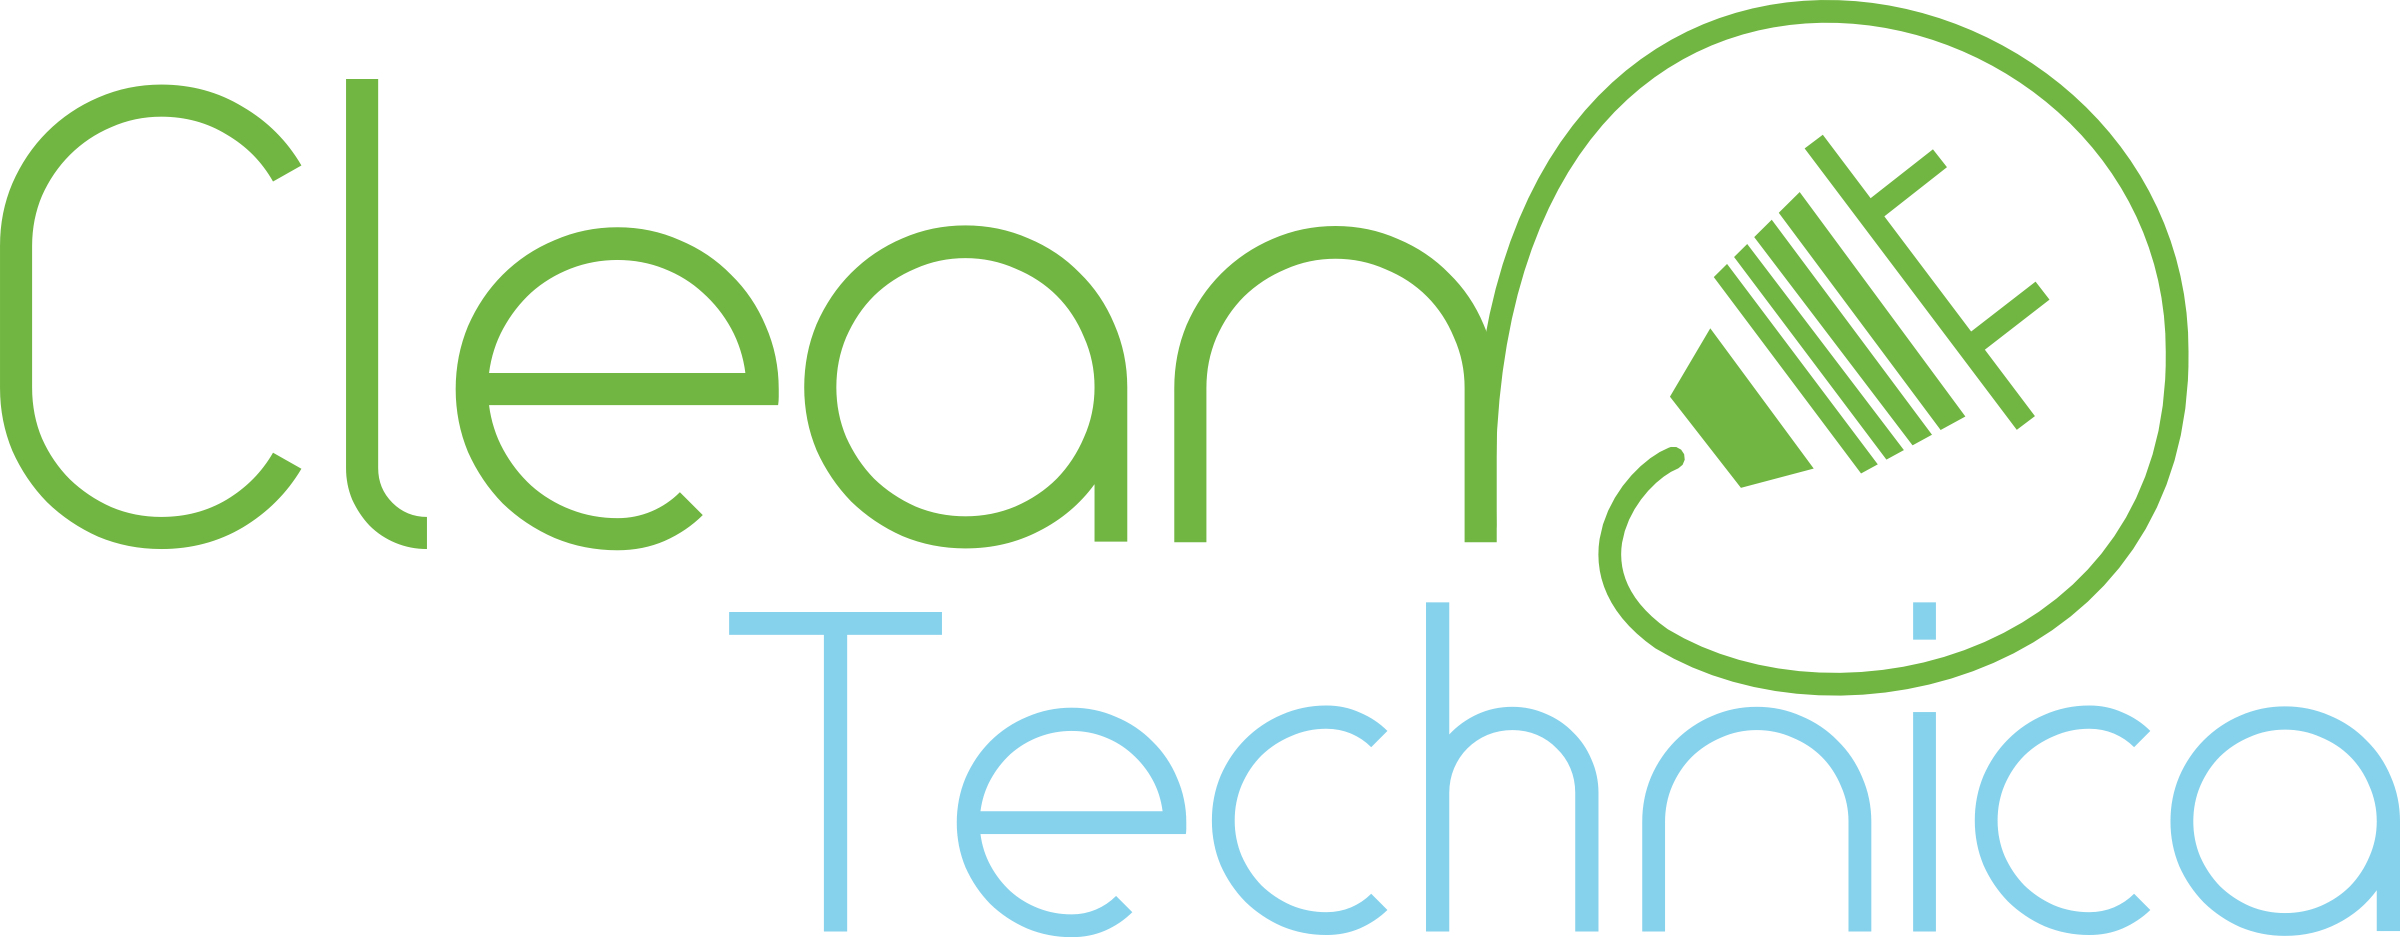 CleanTechnica logo.jpg